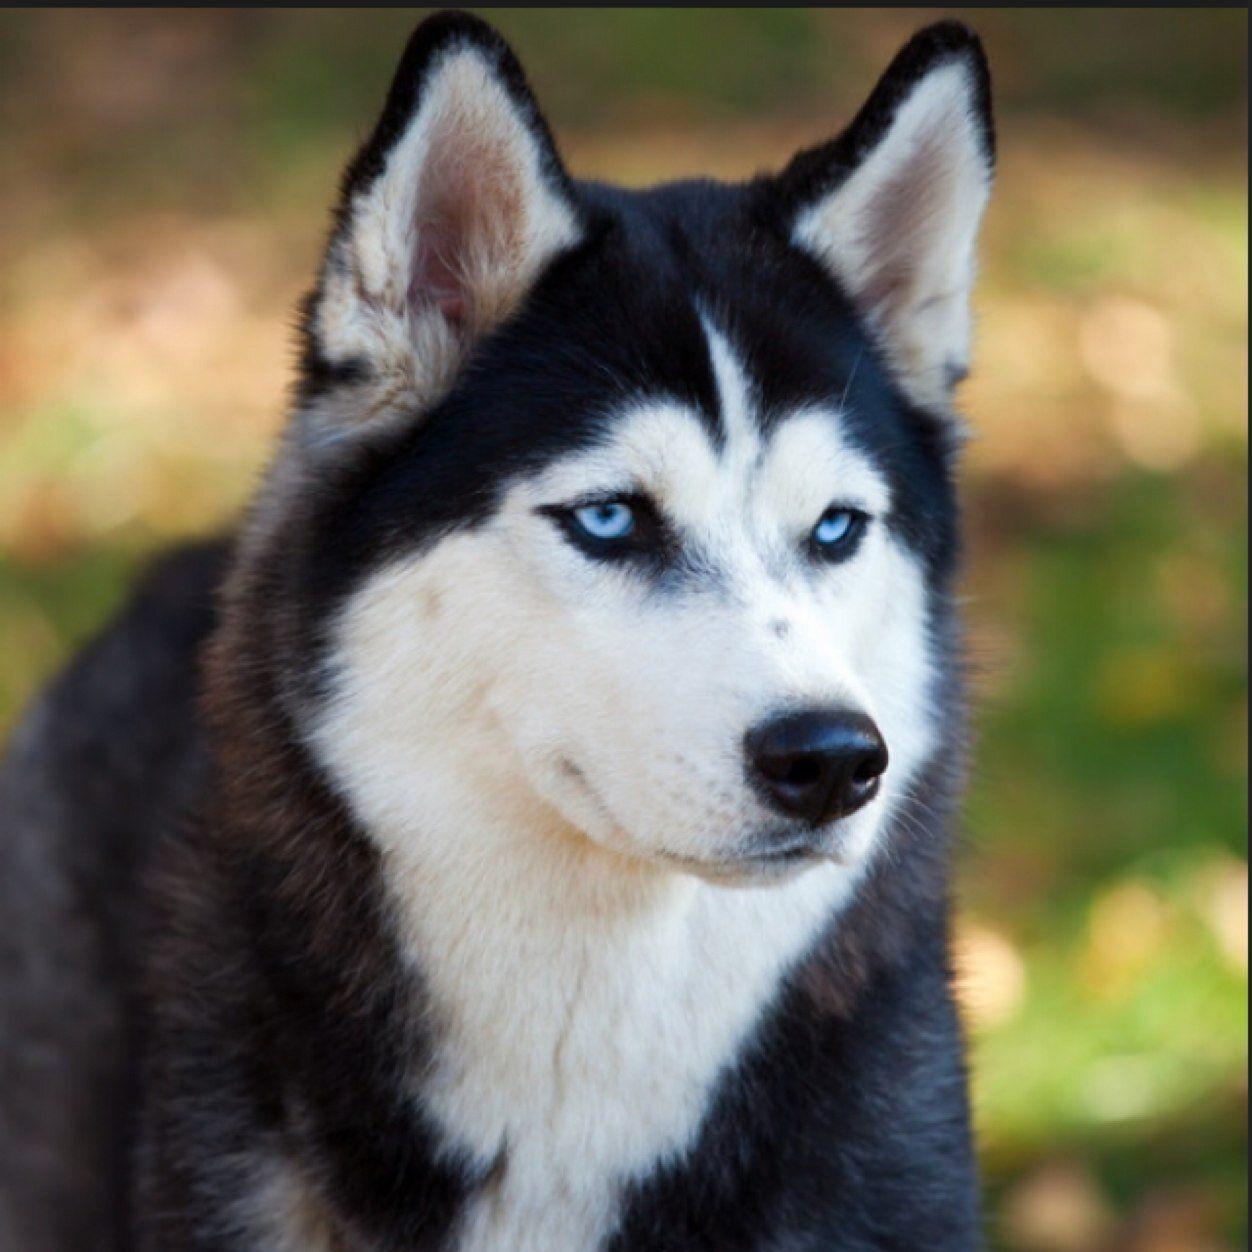 8y0ki2cz Jpeg 1252 1252 Husky Puppy Husky Breeds Siberian Husky